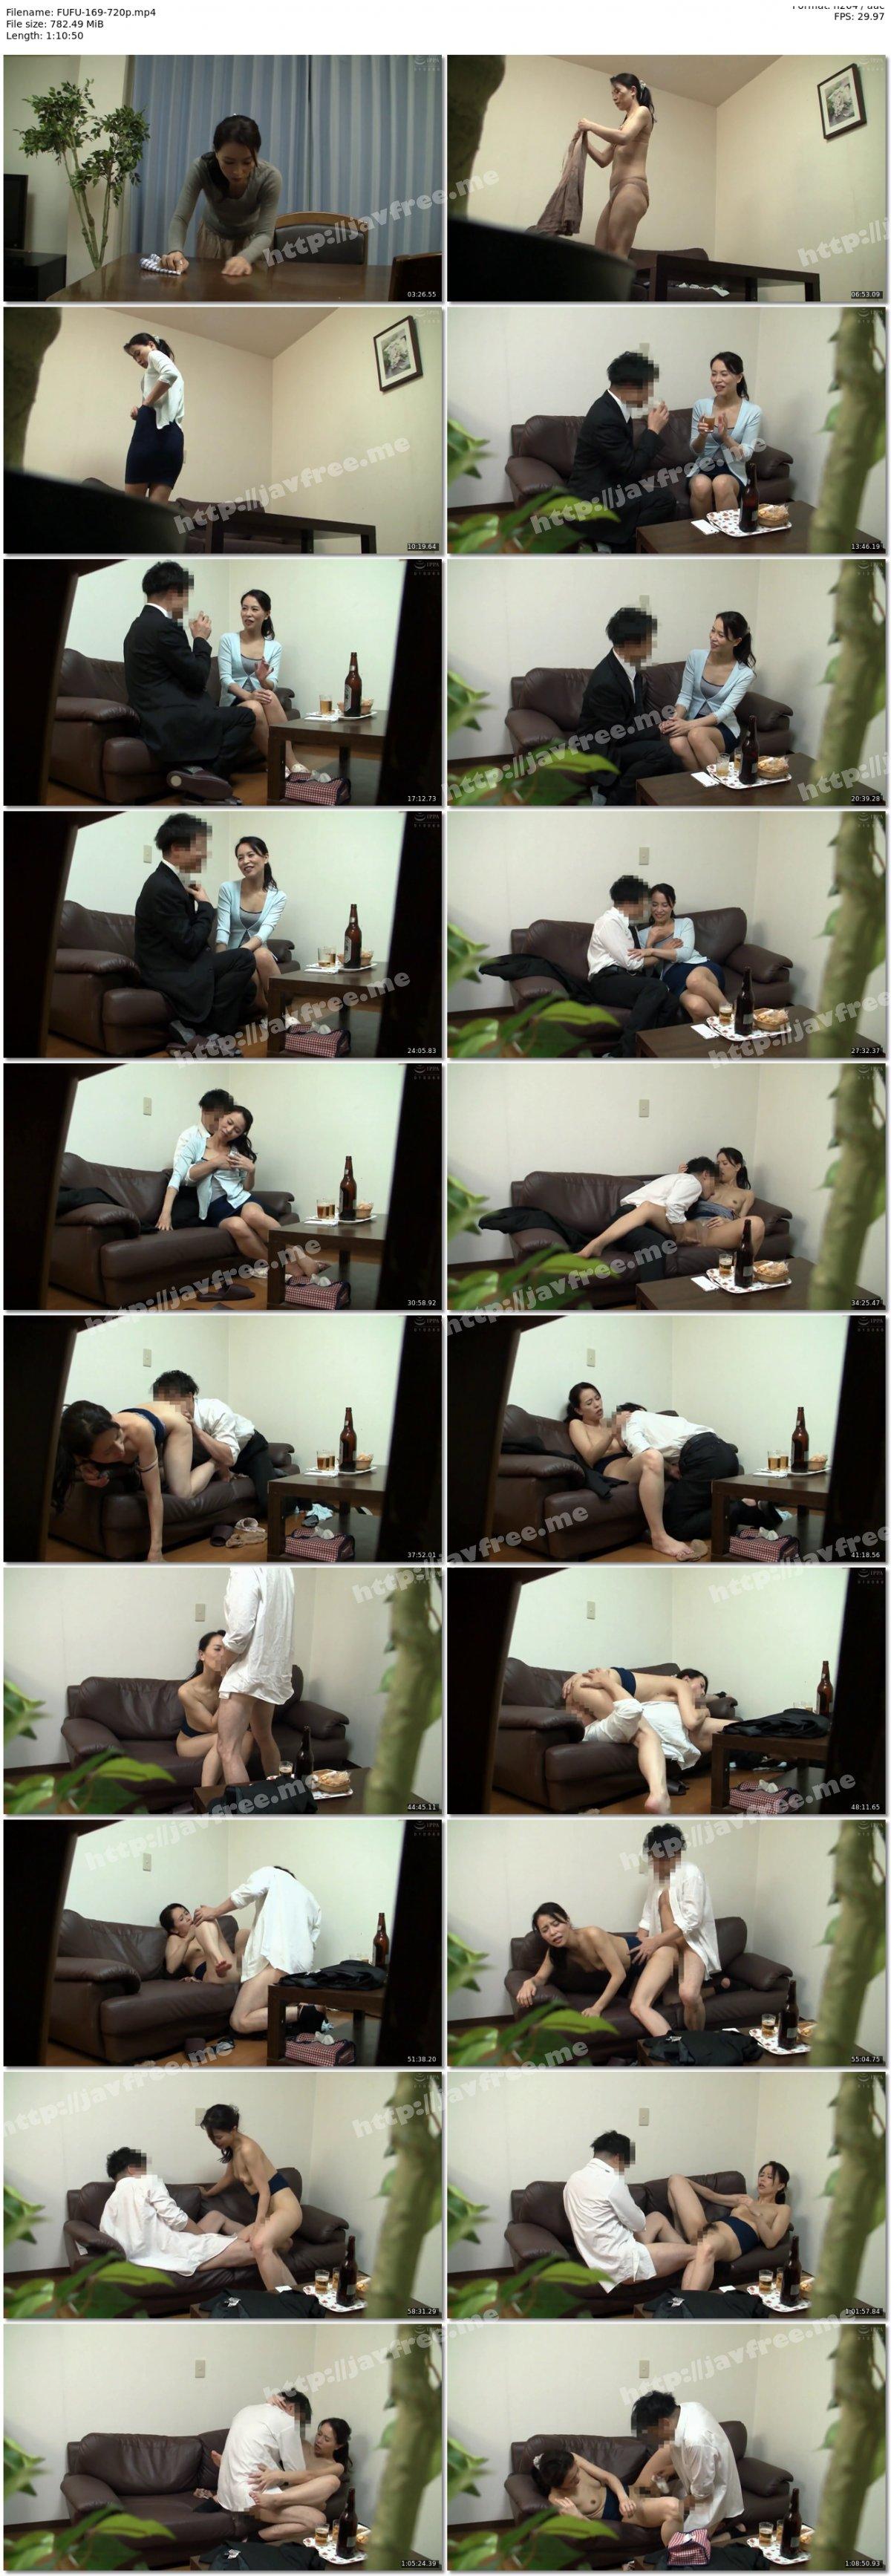 [HD][FUFU-169] 実録 寝取られ 堅物の妻を内緒で酔わせて 若い部下の肉棒を…A子さん(48) - image FUFU-169-720p on https://javfree.me